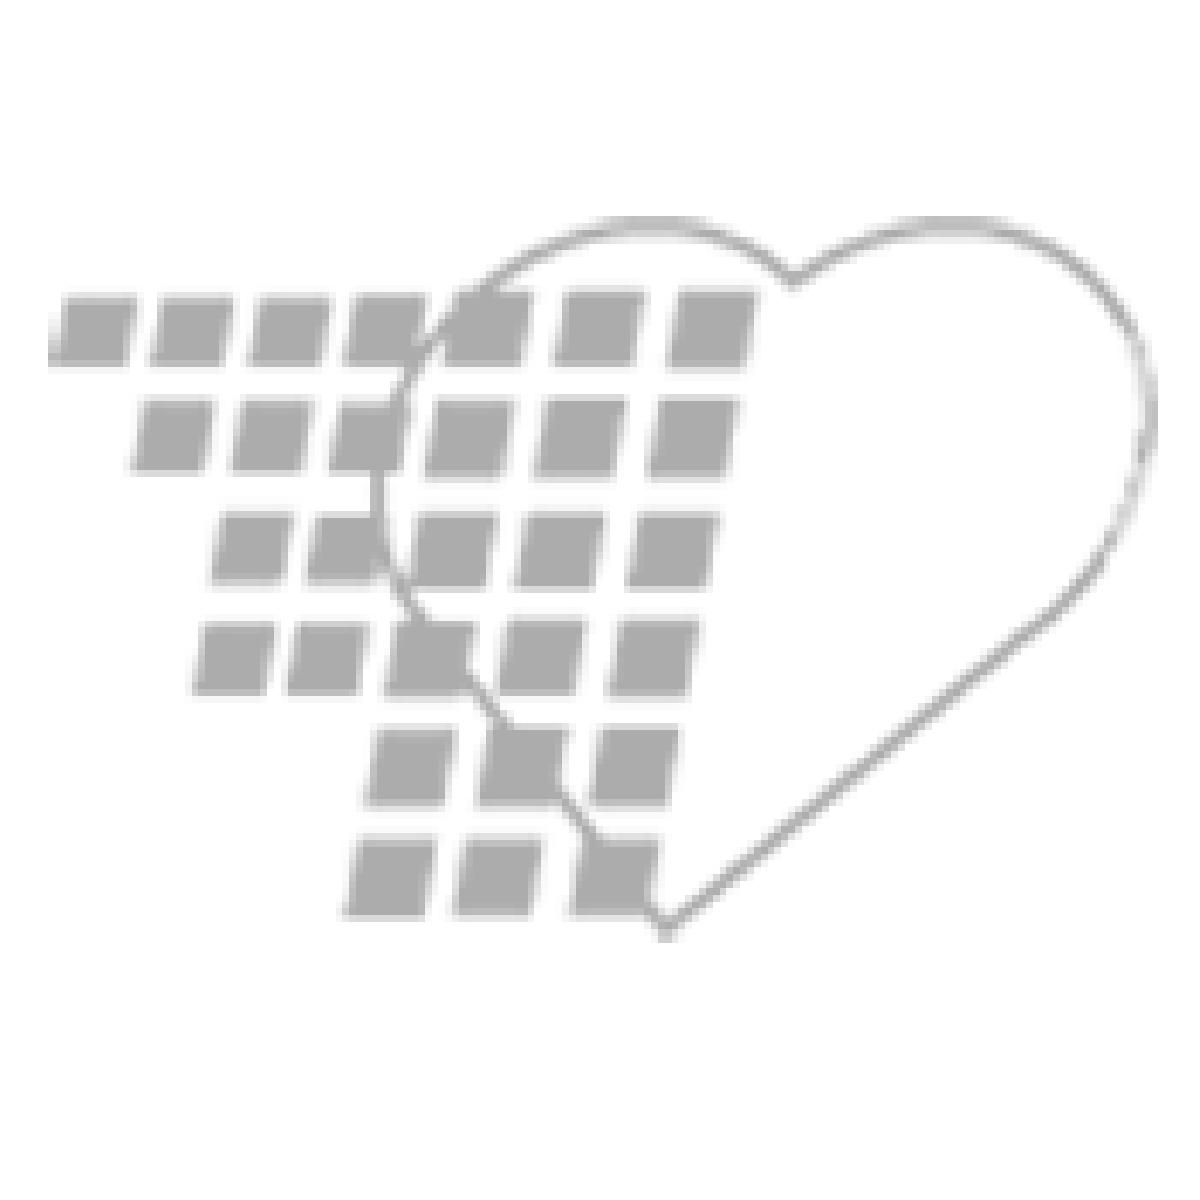 06-93-0082 - Demo Dose® Ibuprofn 400 mg - 1000 Pills/Jar